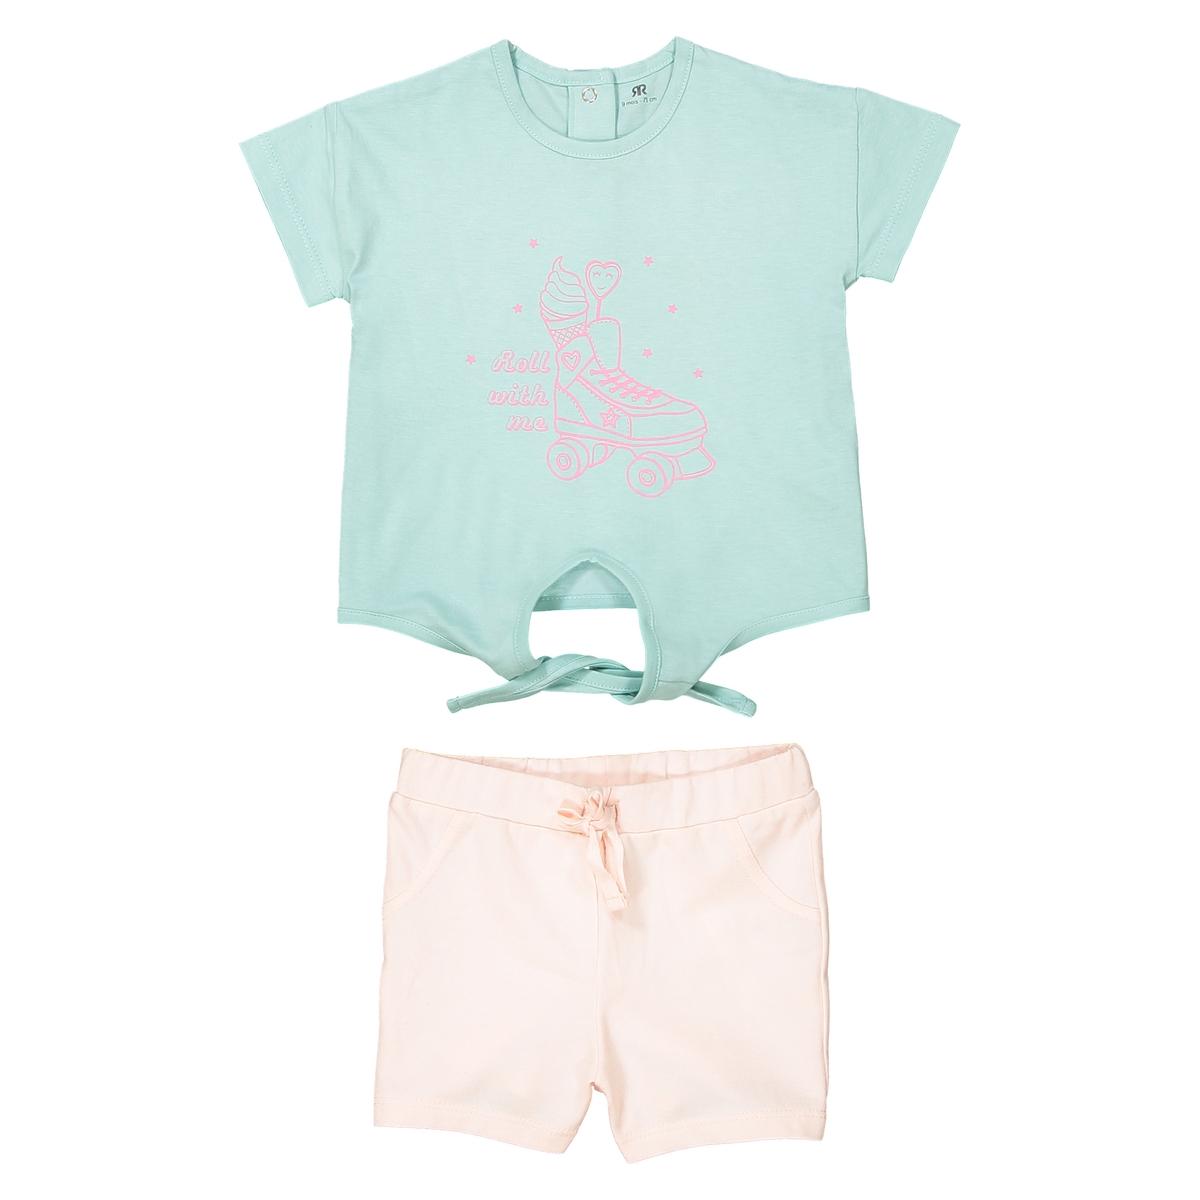 Комплект из футболки и шортов 1 мес. - 3 года, Oeko Tex